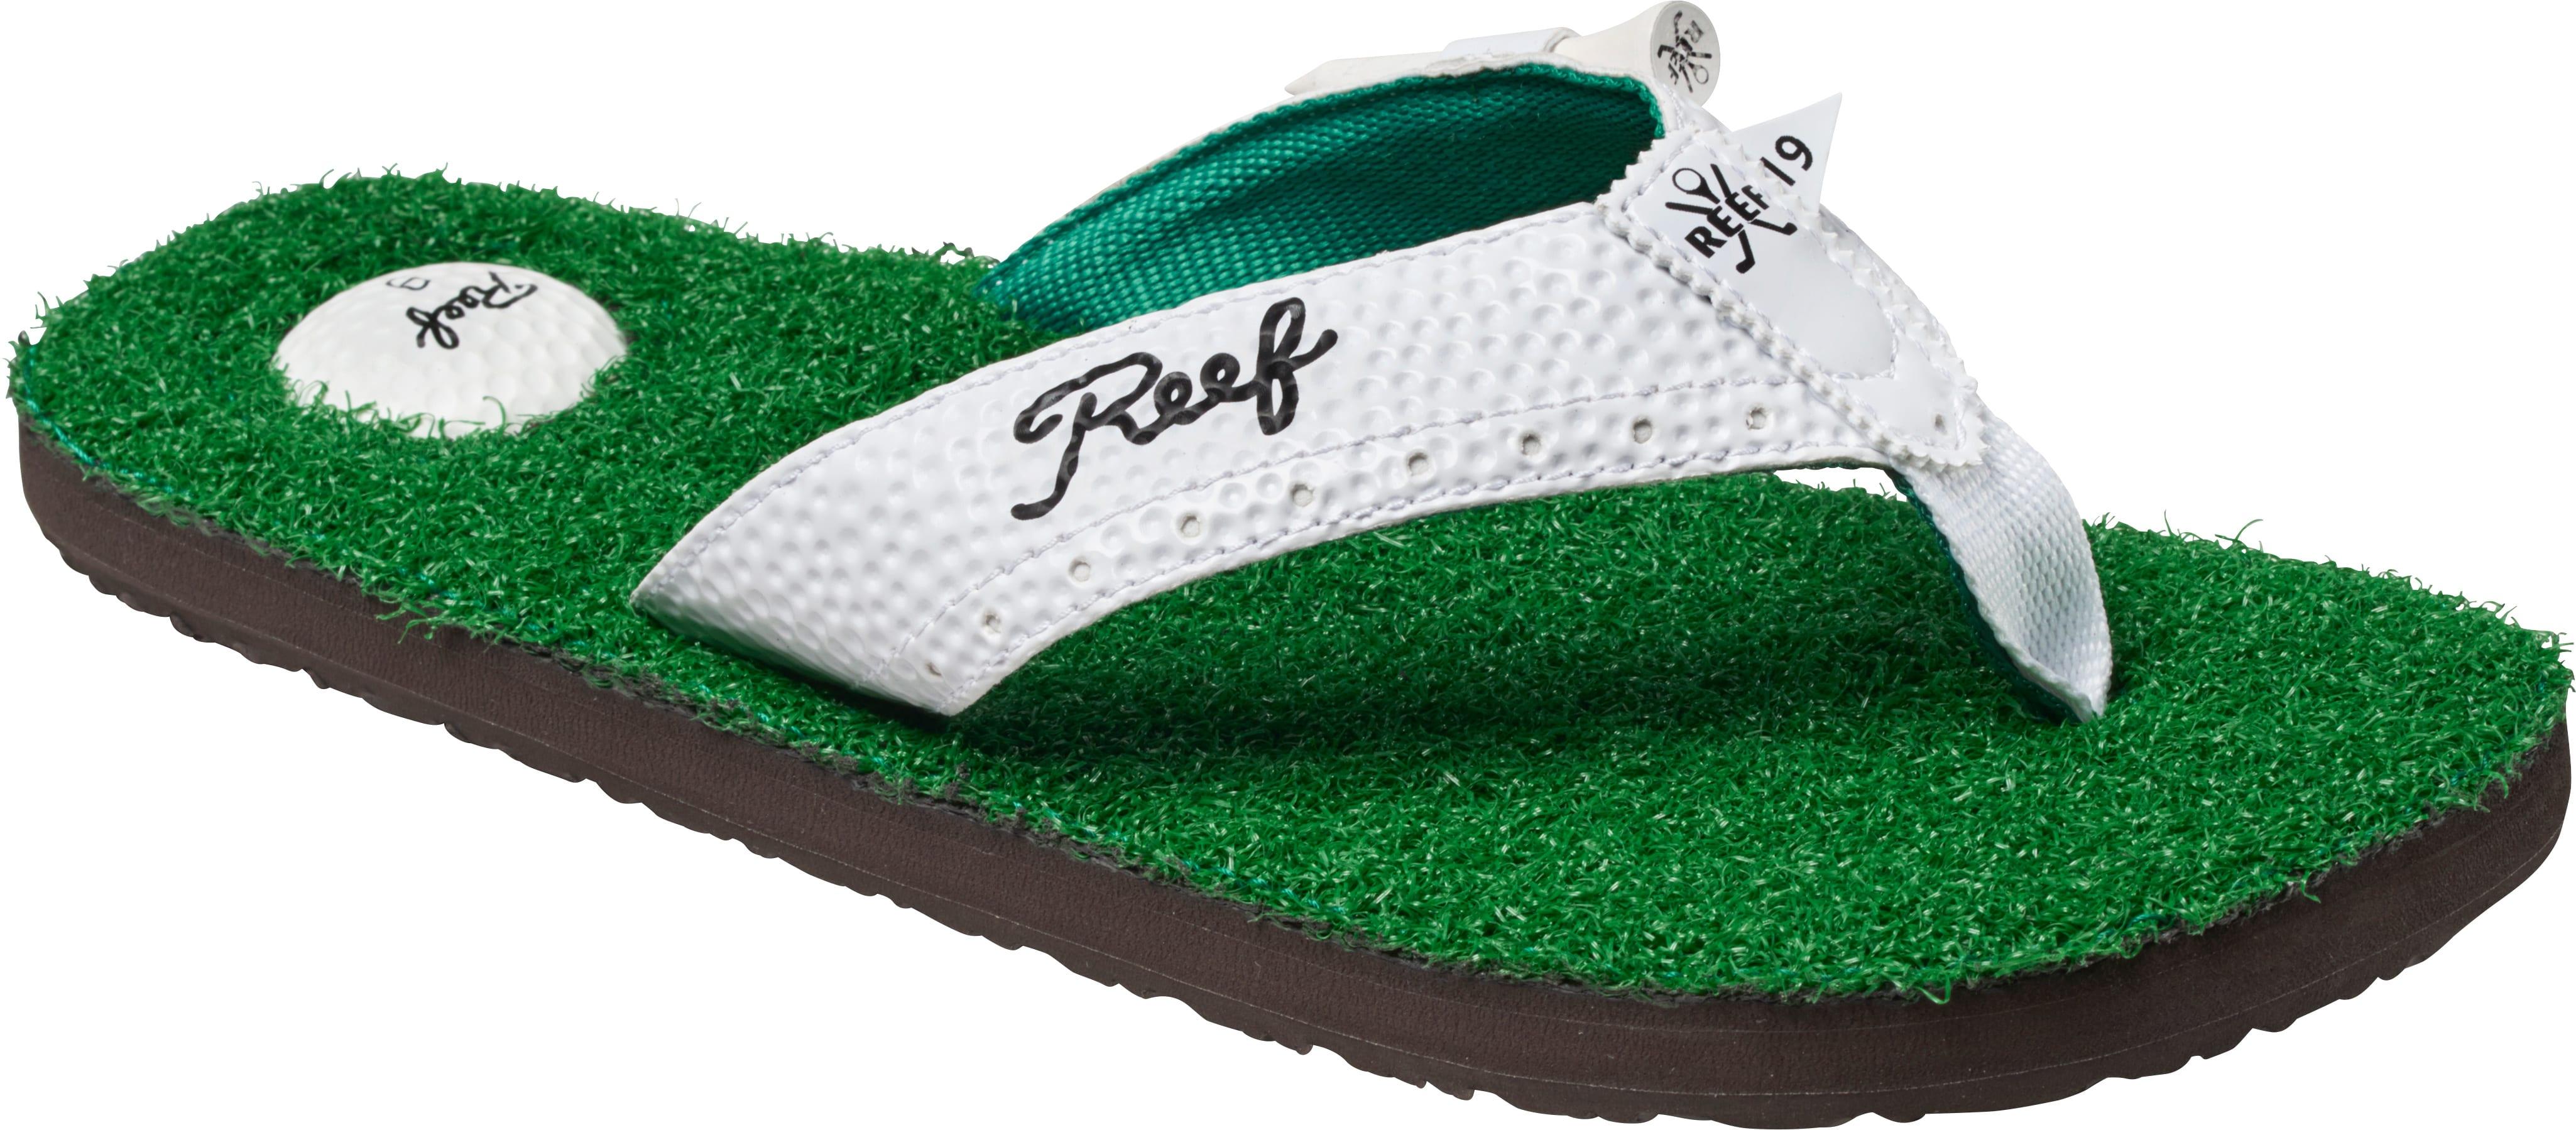 8293770a00a8 Reef Mulligan II Sandals - thumbnail 2